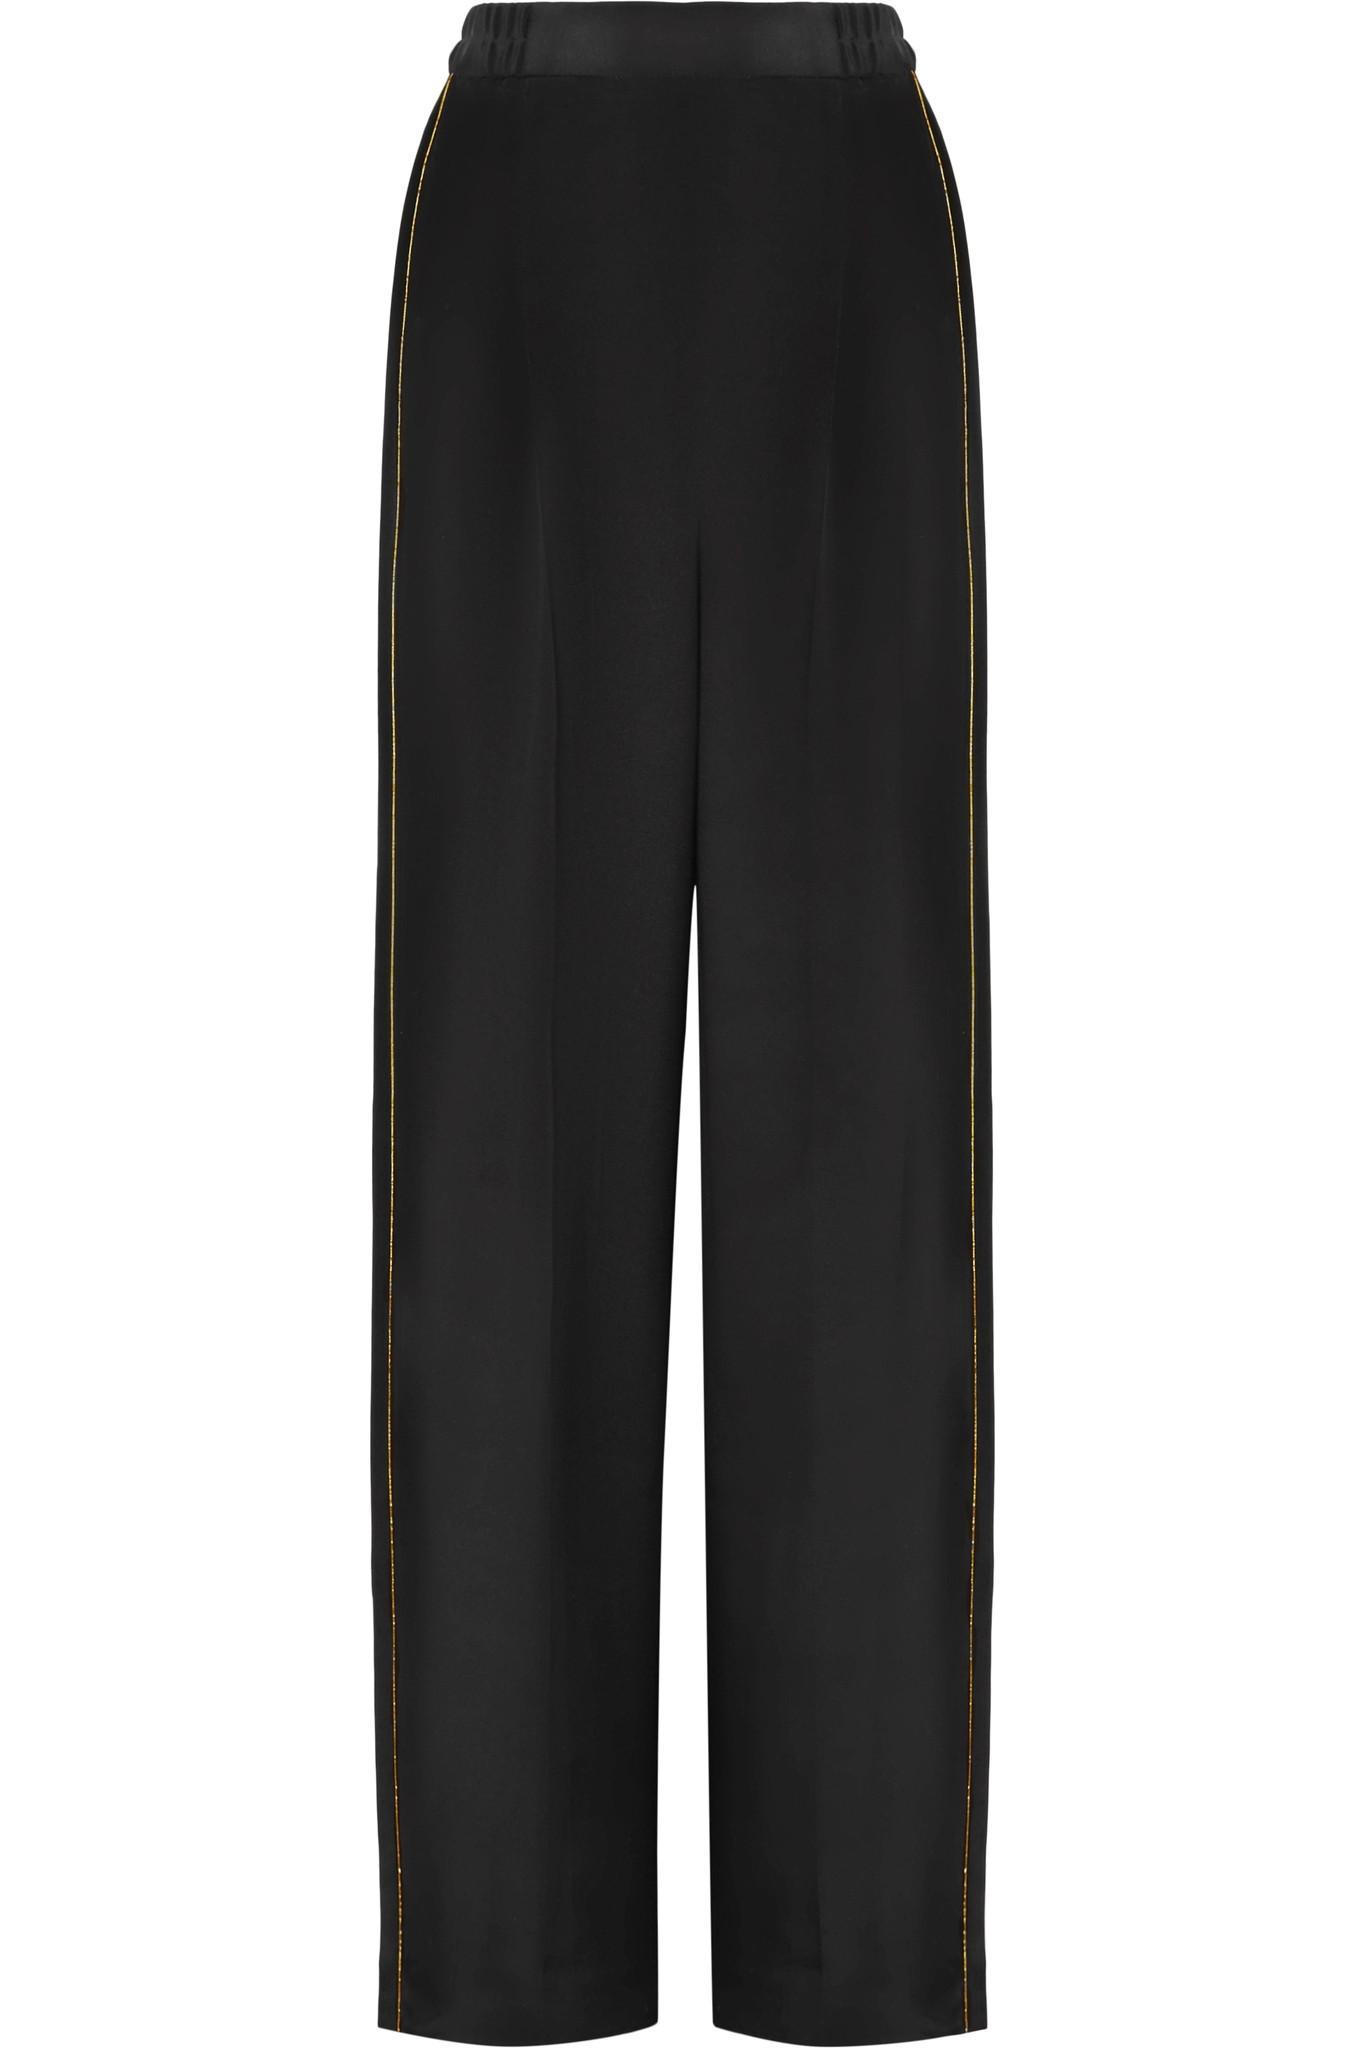 Deals Sale Online Metallic-trimmed Silk Crepe De Chine Wide-leg Pants - Black Stella McCartney Clearance Manchester Cheap Official Site Clearance Finishline Websites Cheap Online dc4i3p